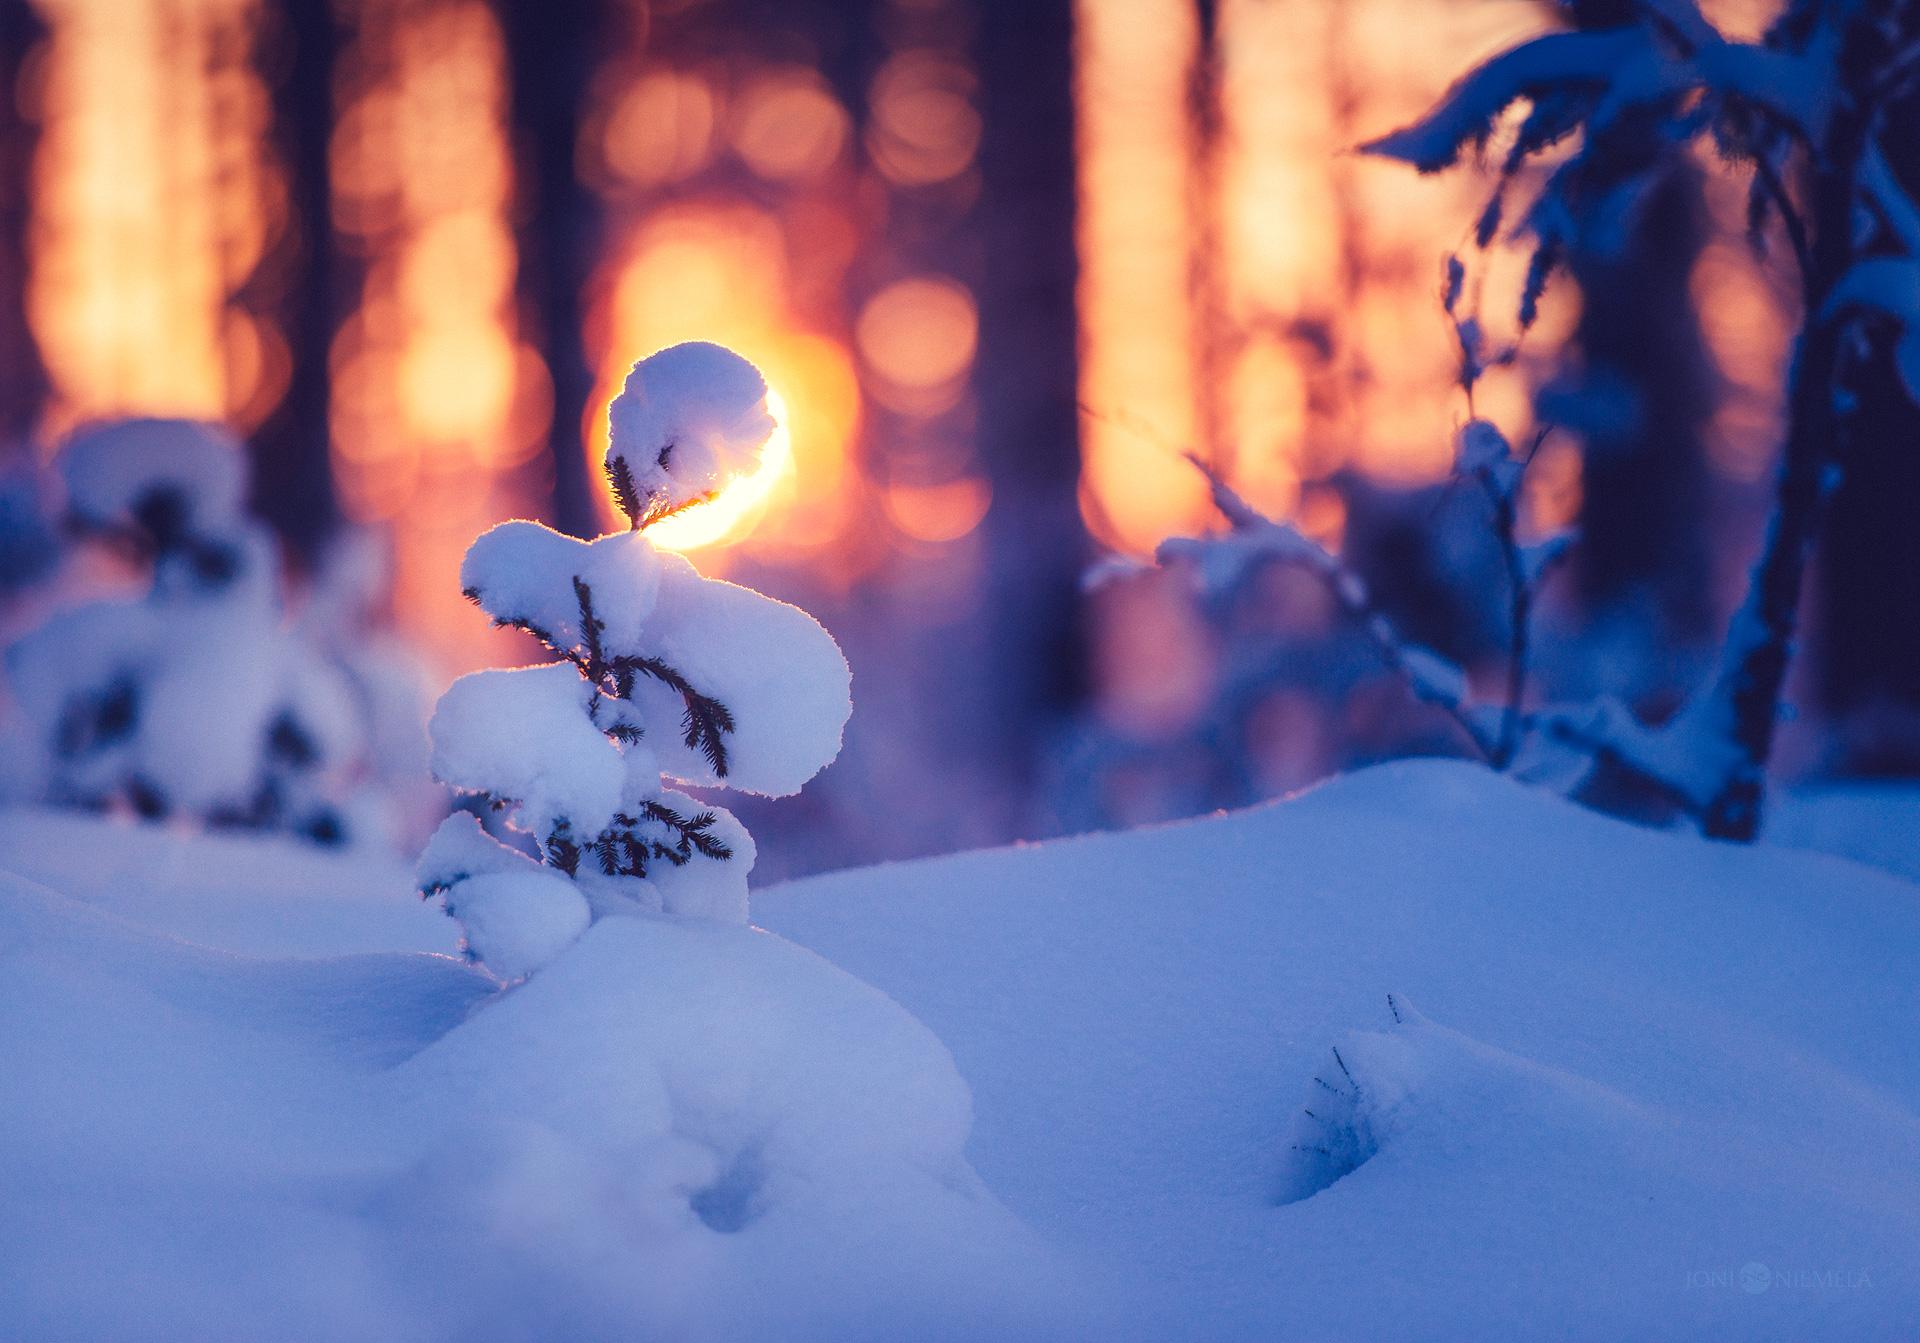 Sapling Under The Snow